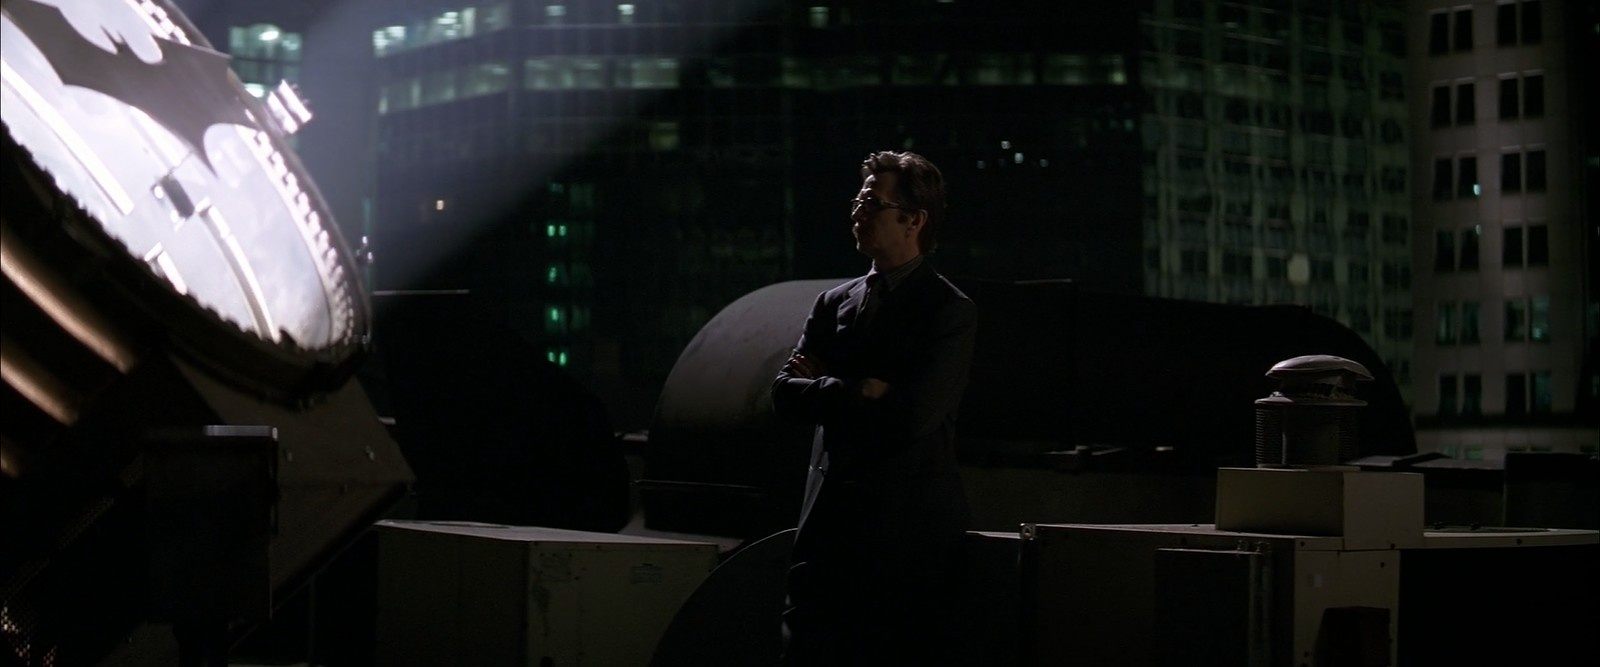 Galerie The Dark Knight : Le Chevalier noir 9